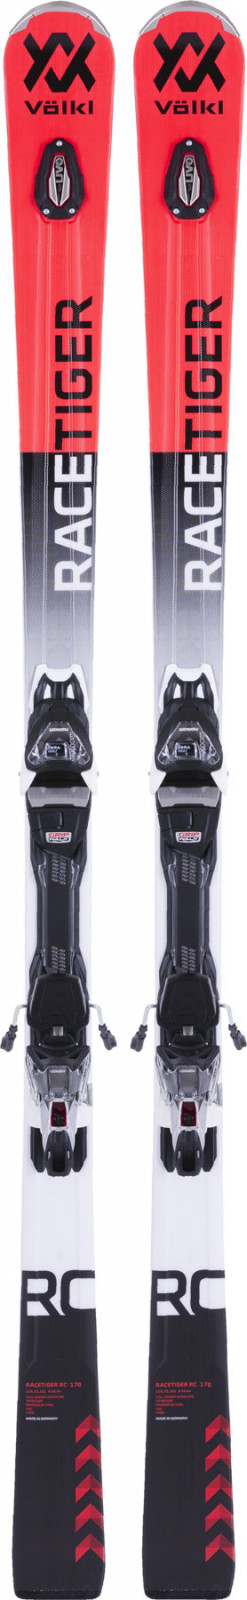 Völkl Racetiger RC Red + vMotion 12 GW